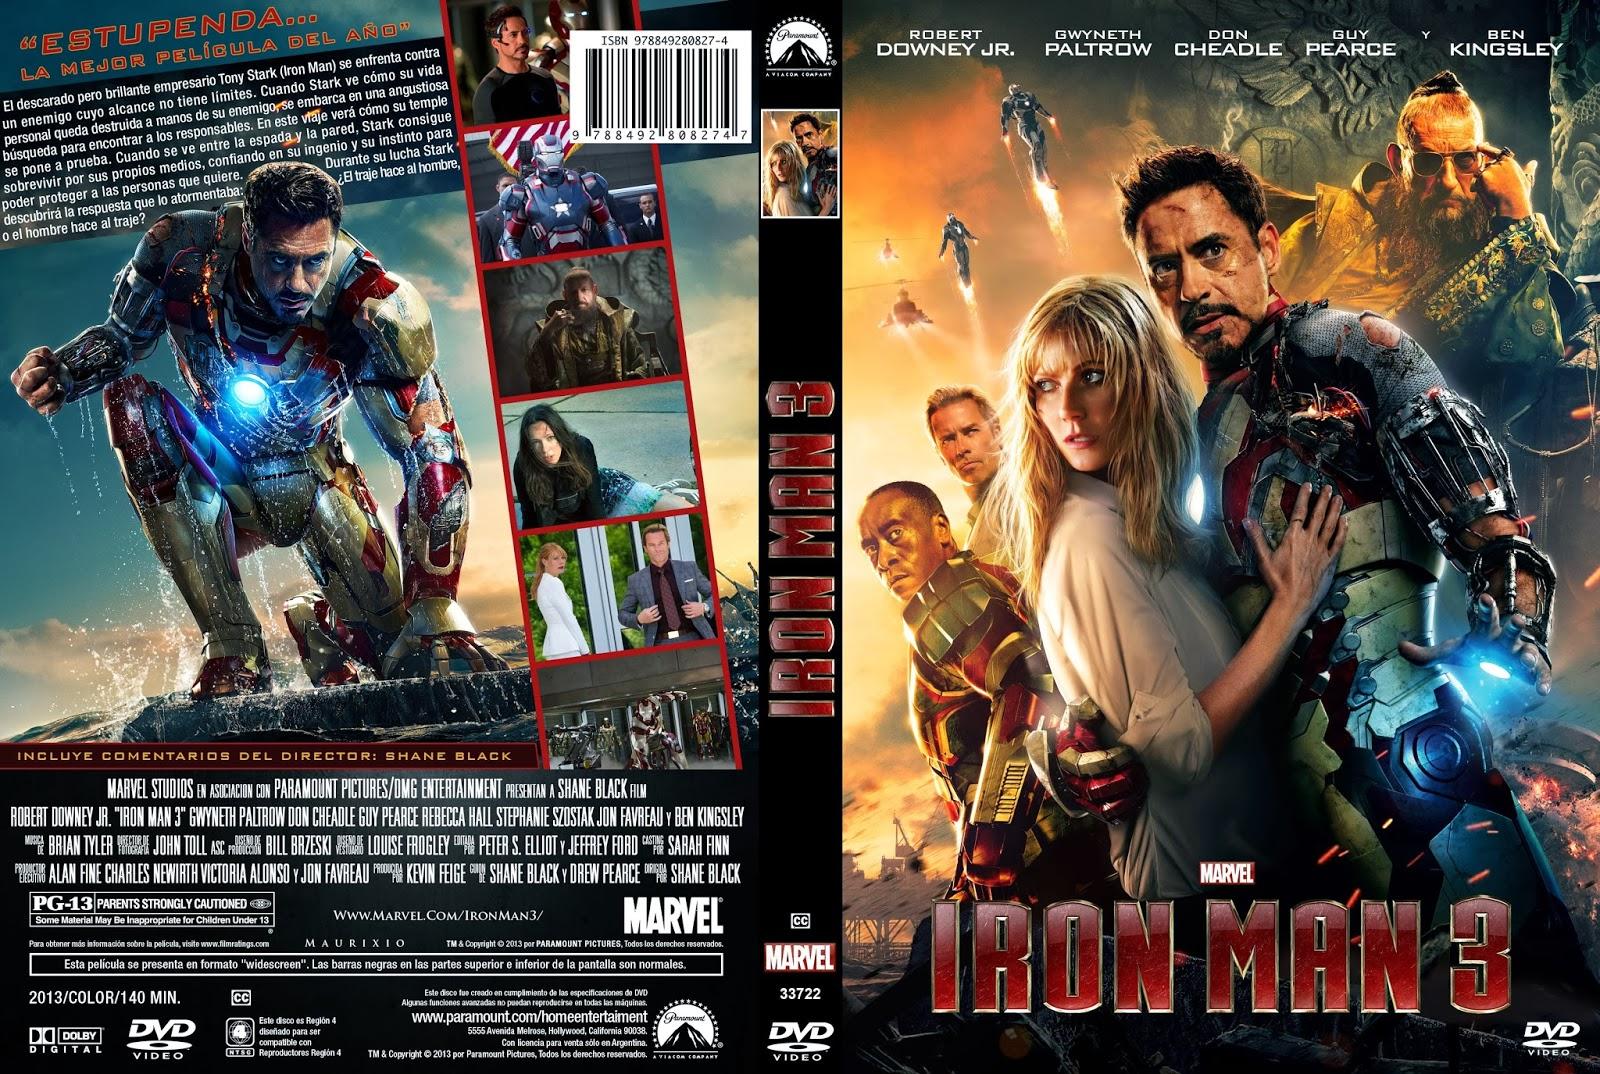 Iron Man 3 Hdrip Castellano 2013